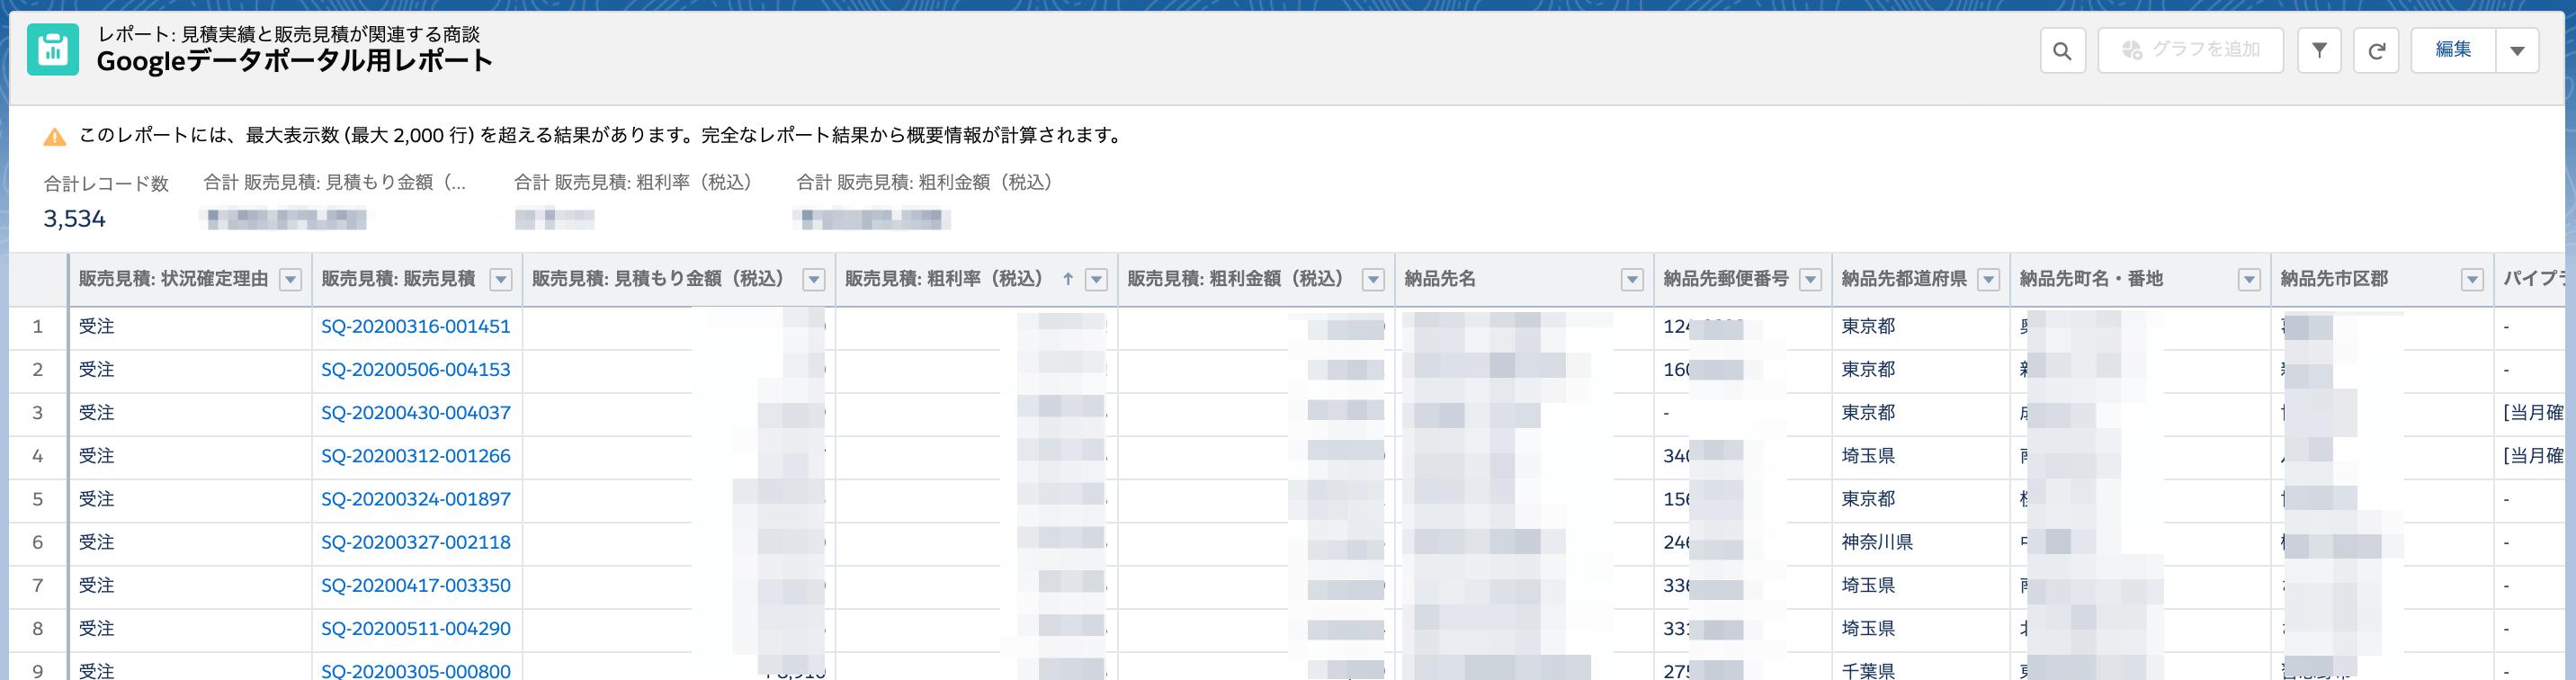 【Googleデータポータル】Salesforceに接続してダッシュボードを作成する方法。